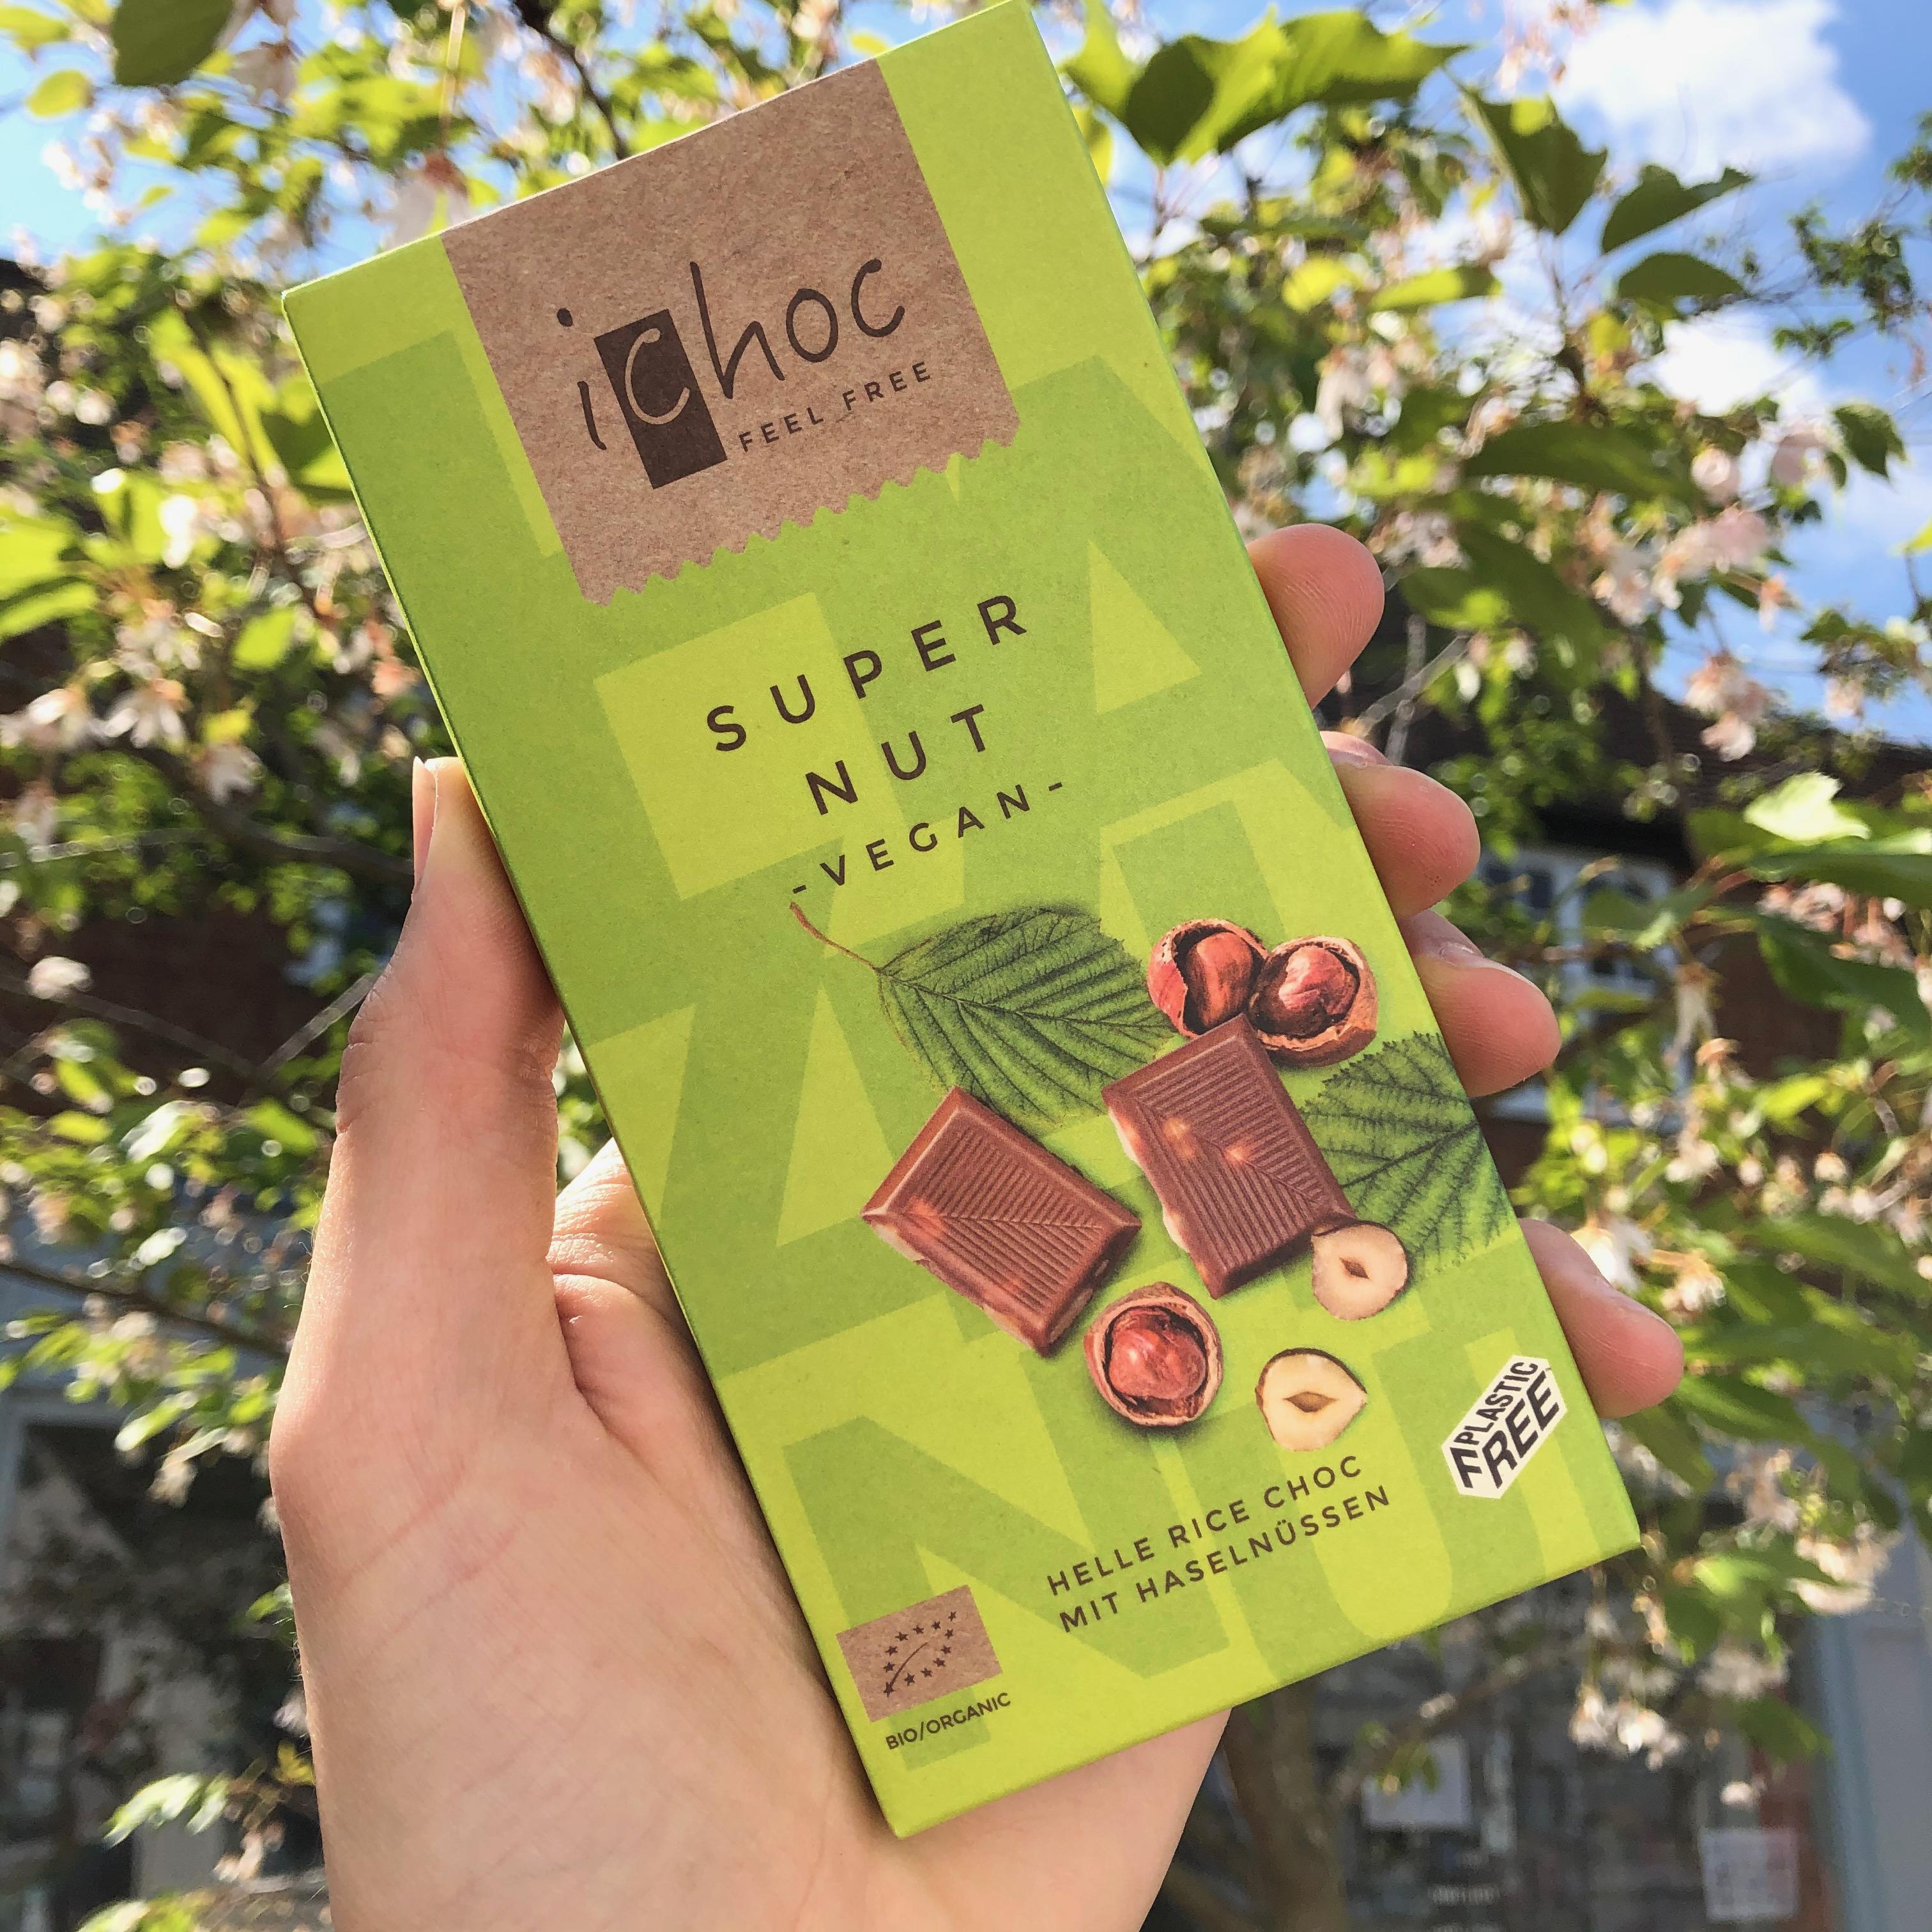 I Choc Super Nut 80g